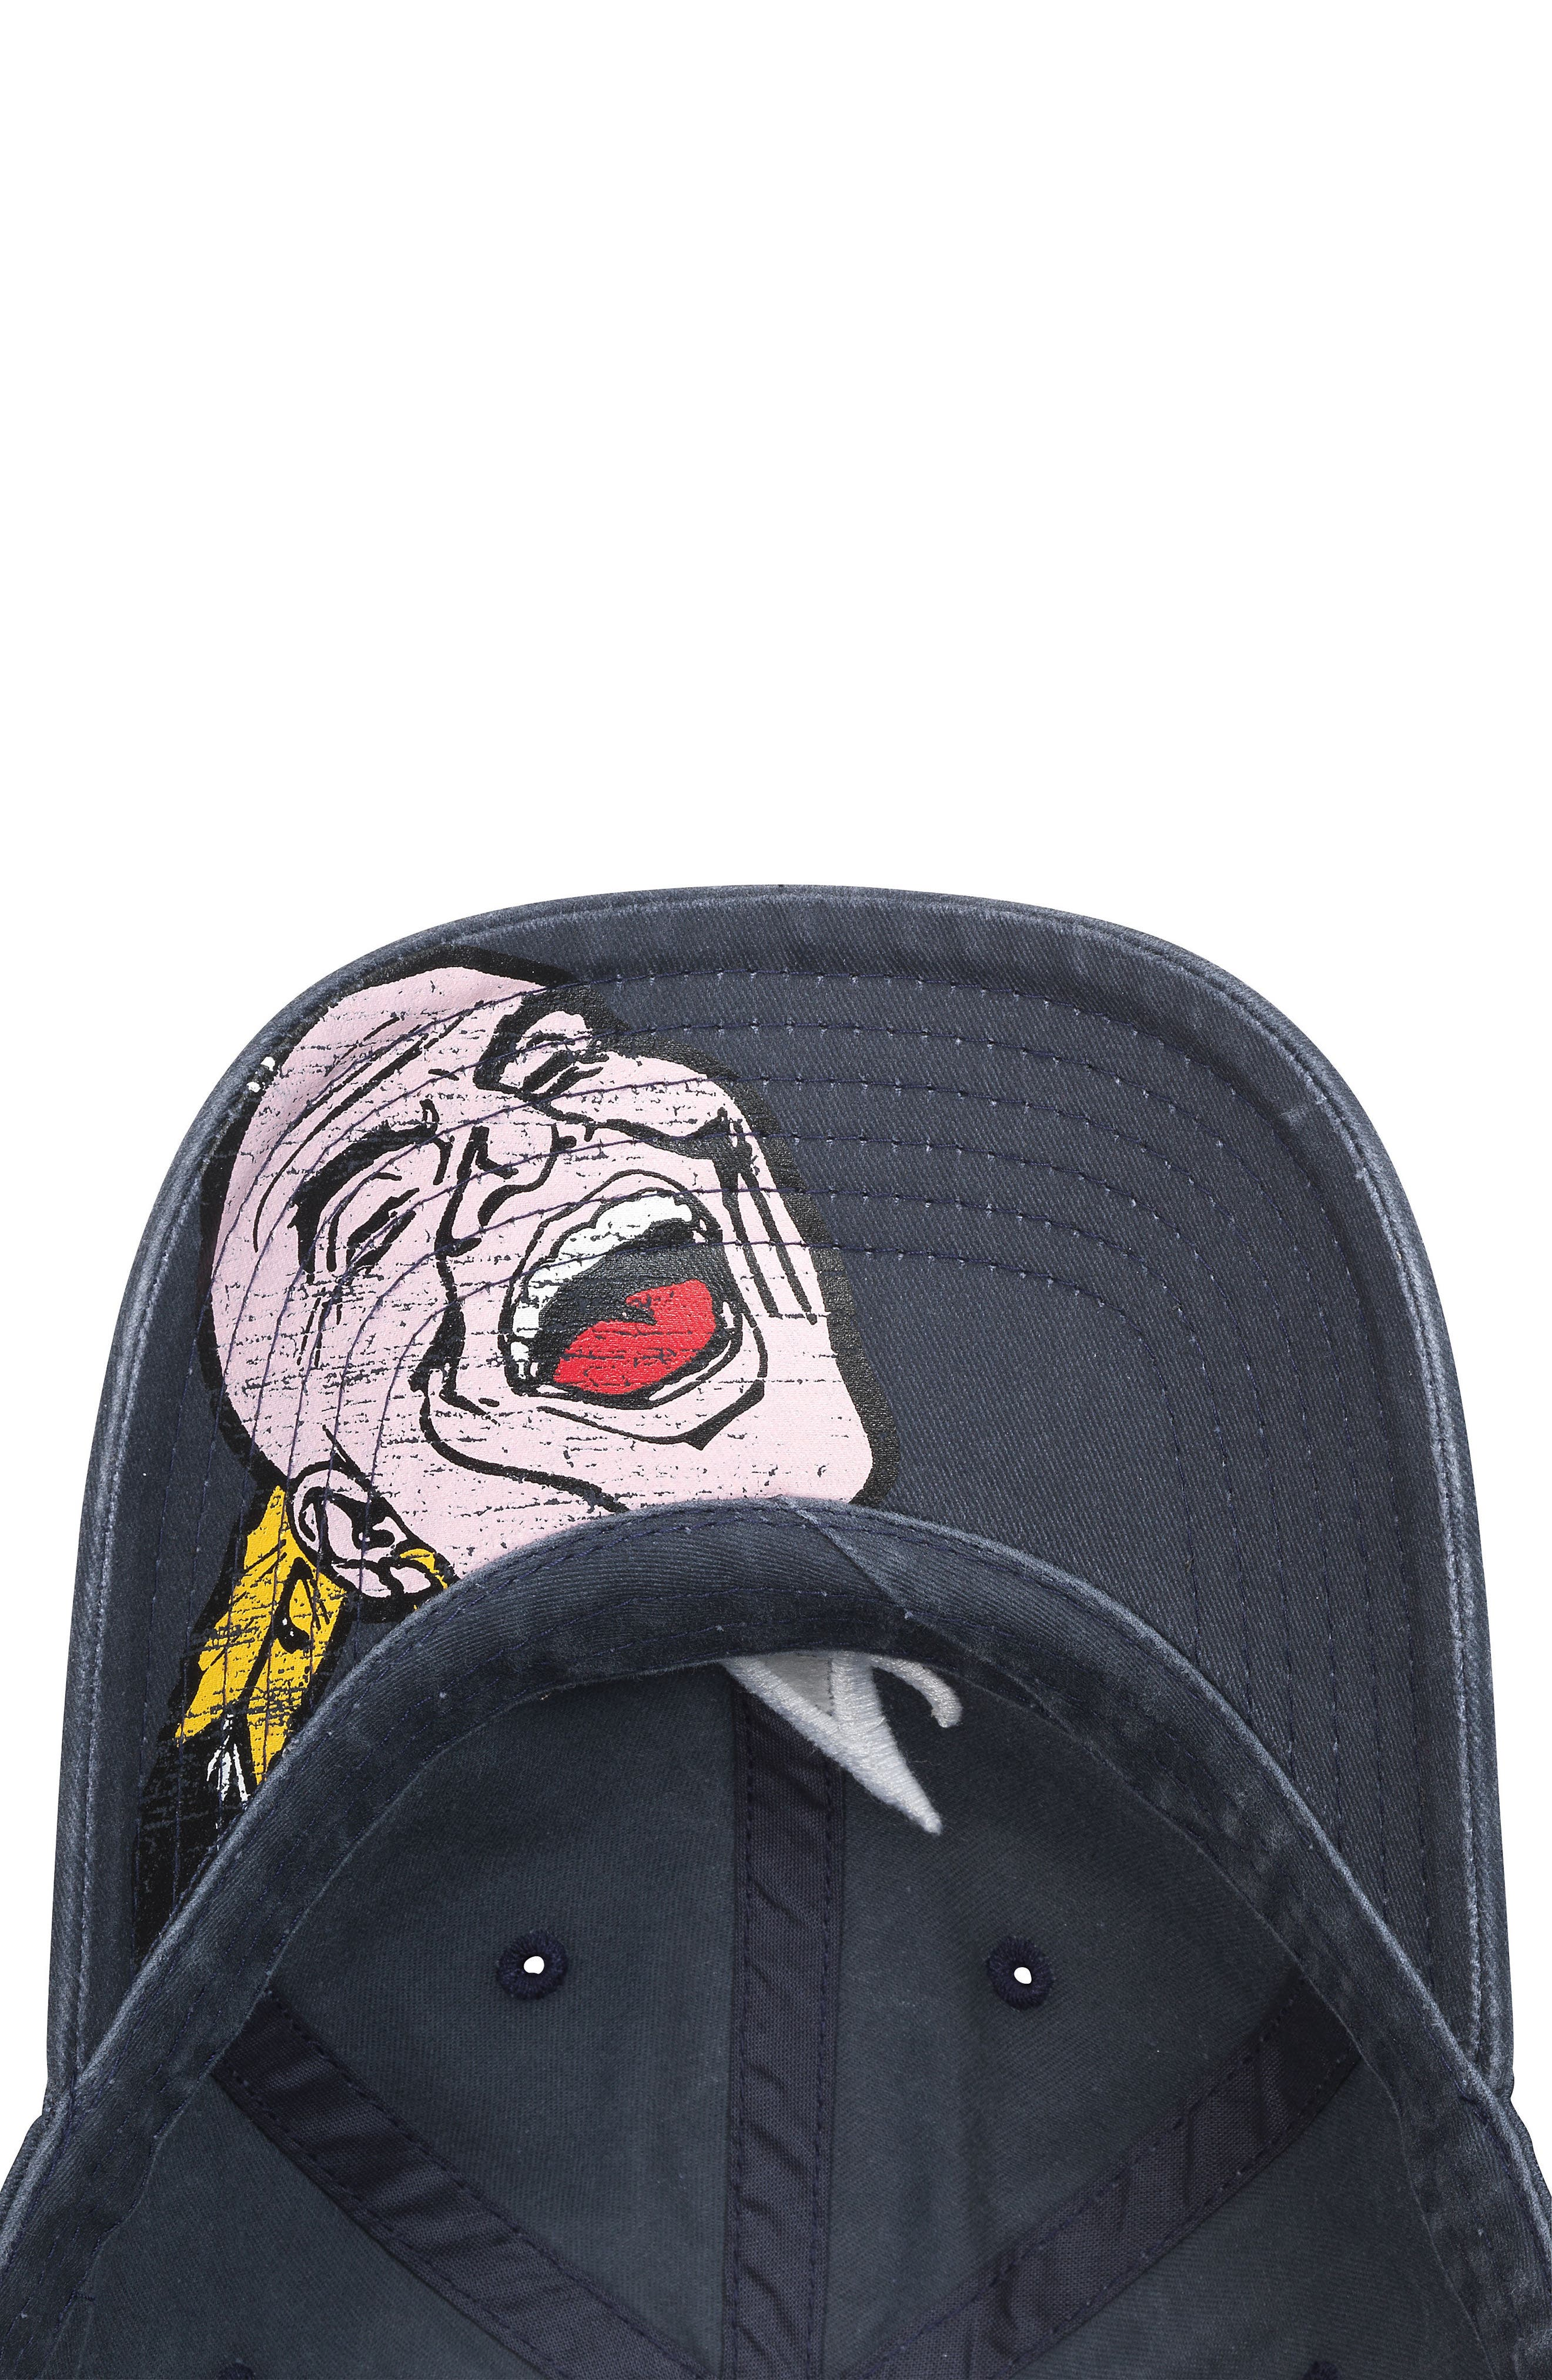 New Raglan - Atlanta Braves Baseball Cap,                             Alternate thumbnail 2, color,                             400